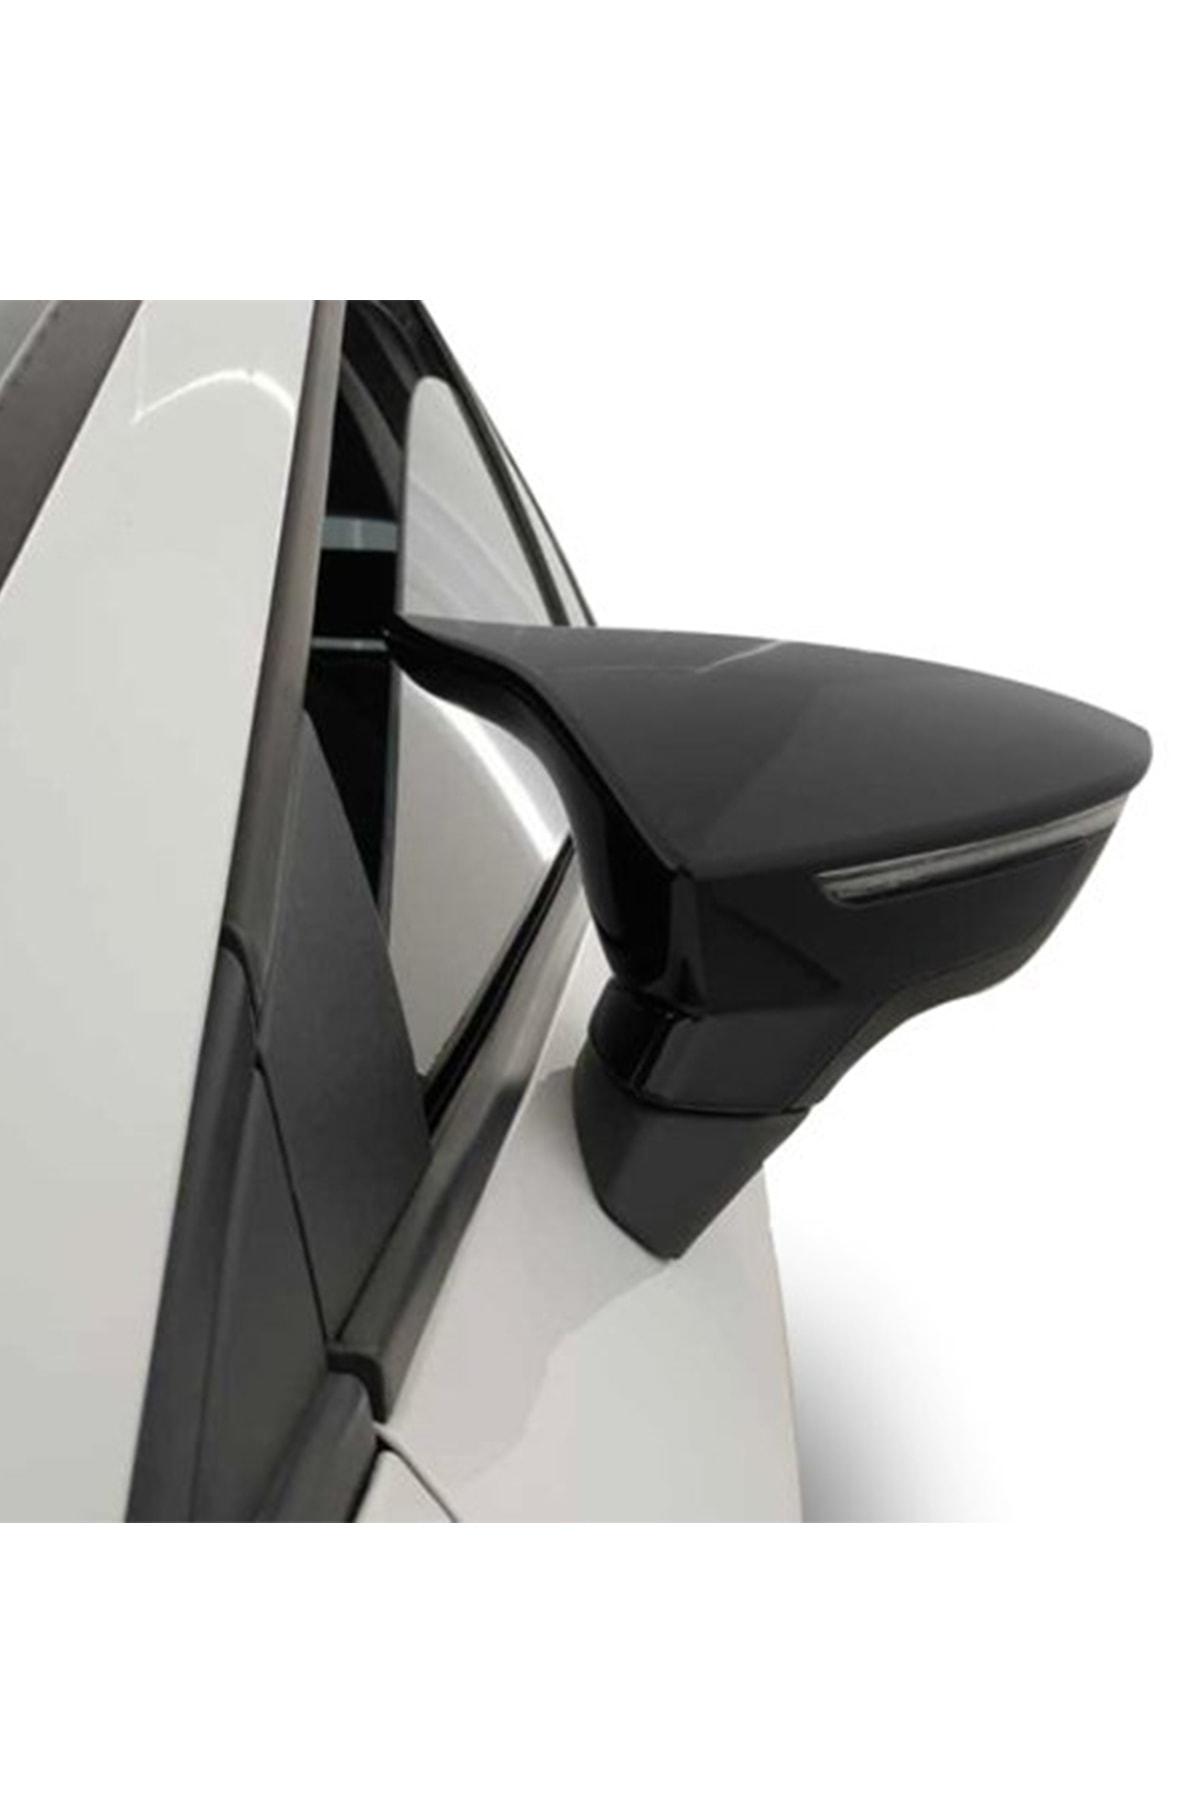 BigS Honda Civic Fd6 2006-2011 Araca Özel Yarasa Ayna Kapağı 1